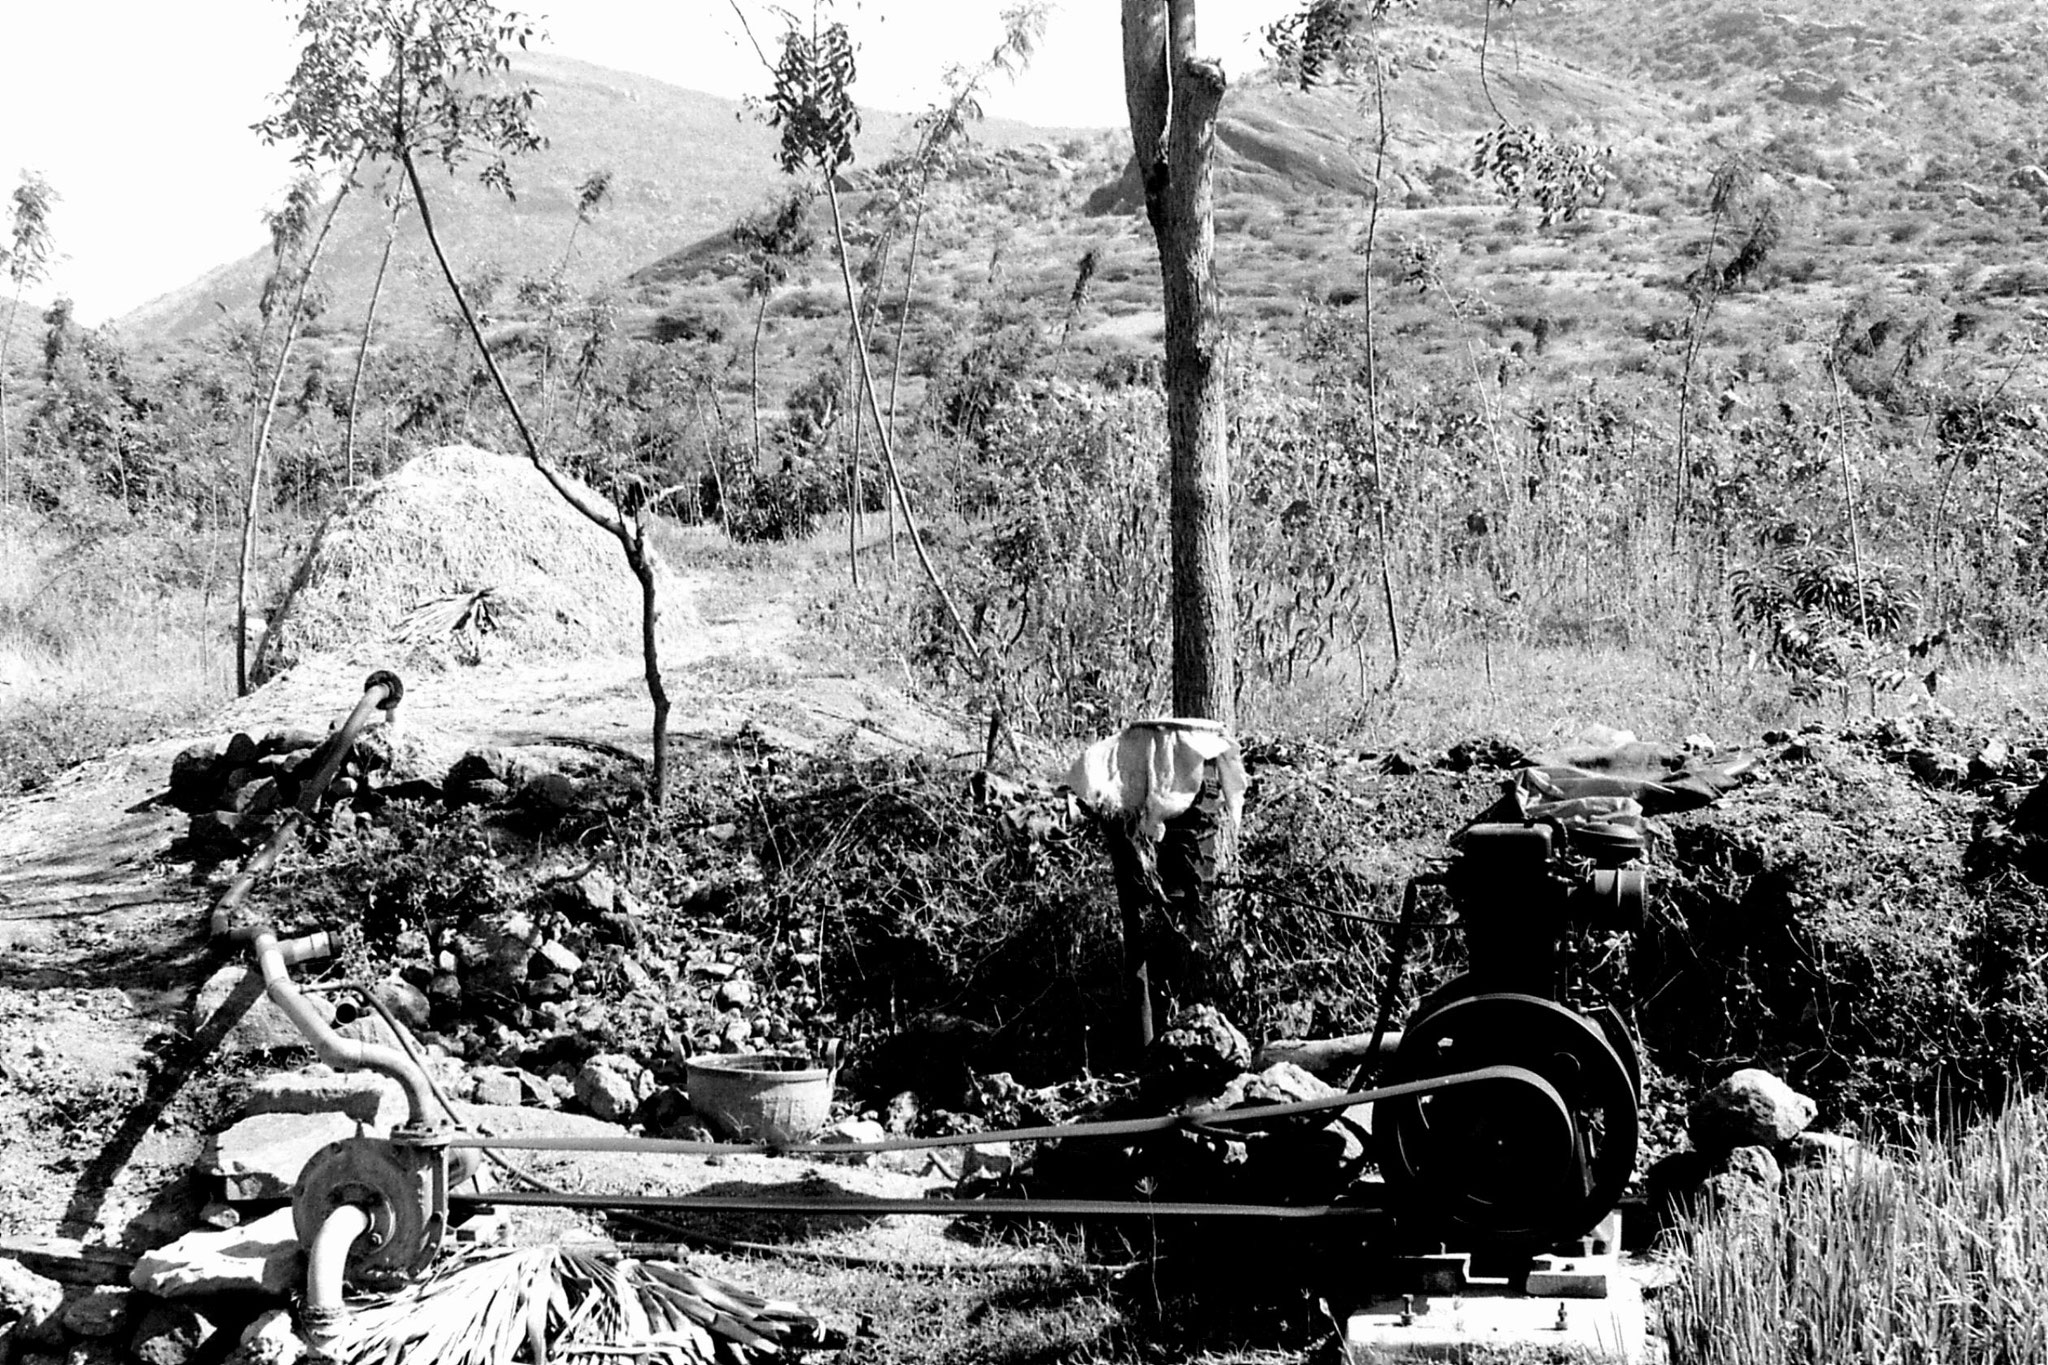 21/2/1990: 18: Batlagundi afforestation project